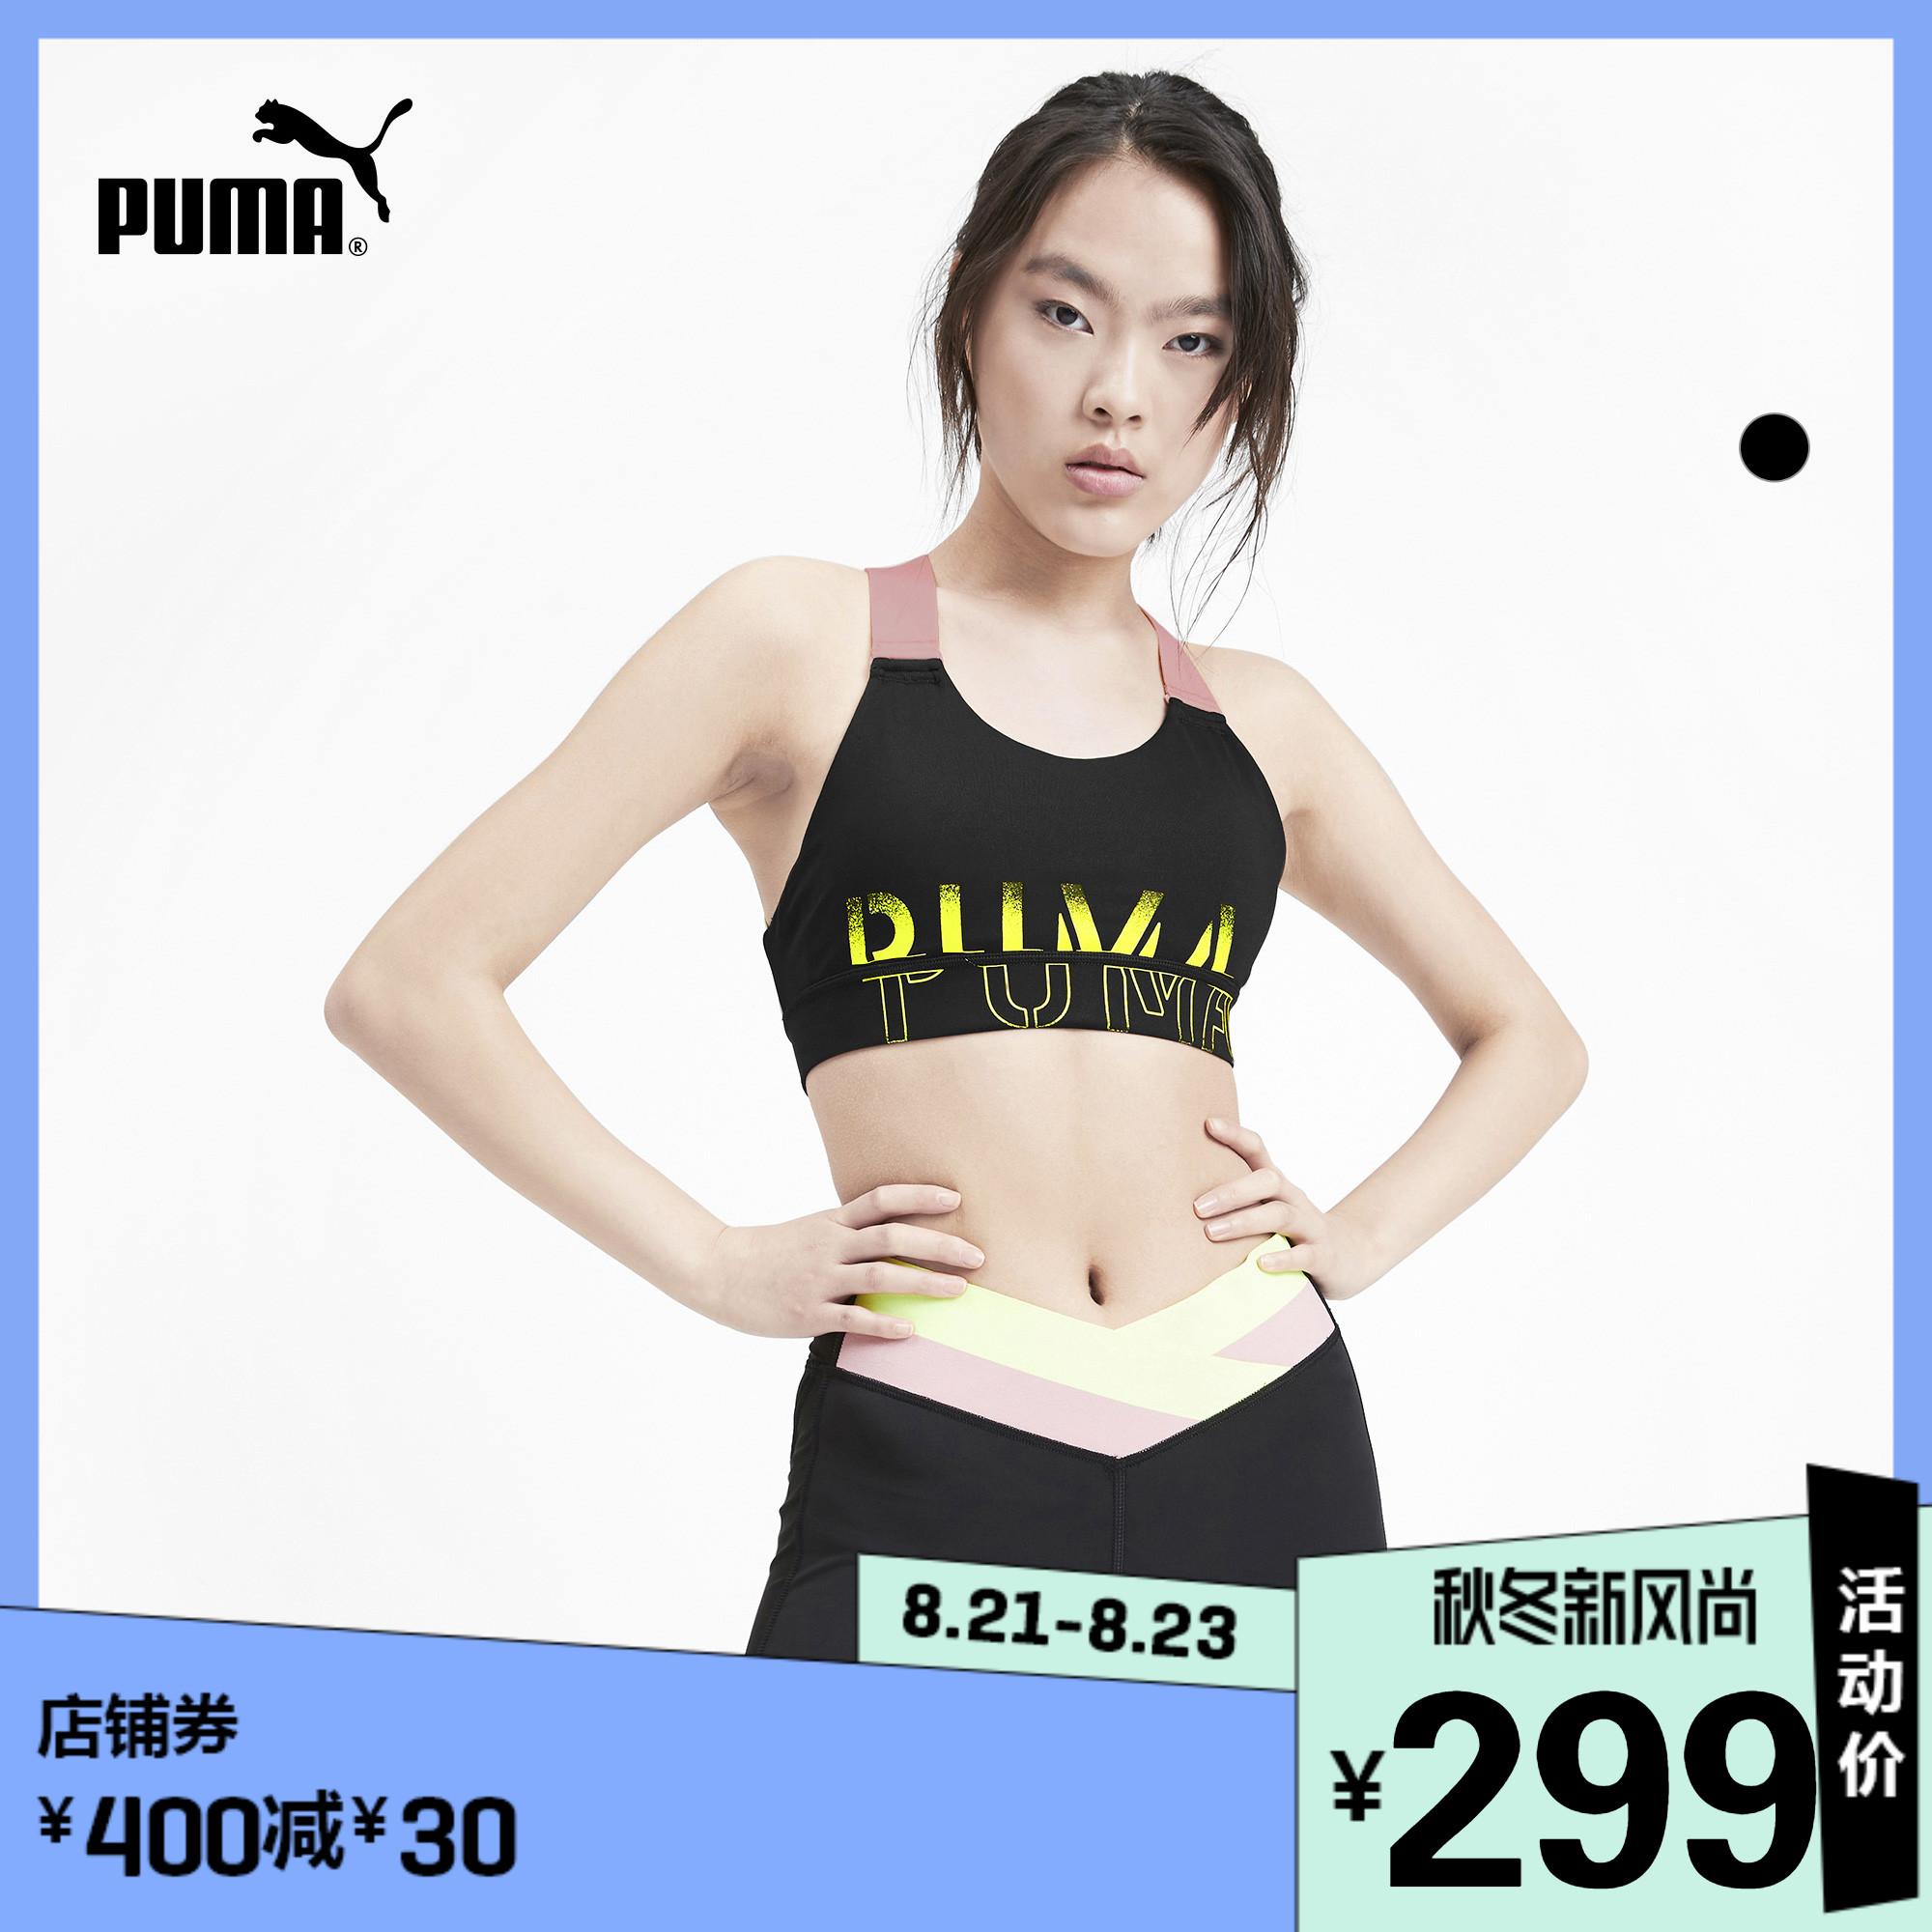 PUMA彪马官方正品娜扎同款新款女子撞色运动内衣FEEL IT M 518289